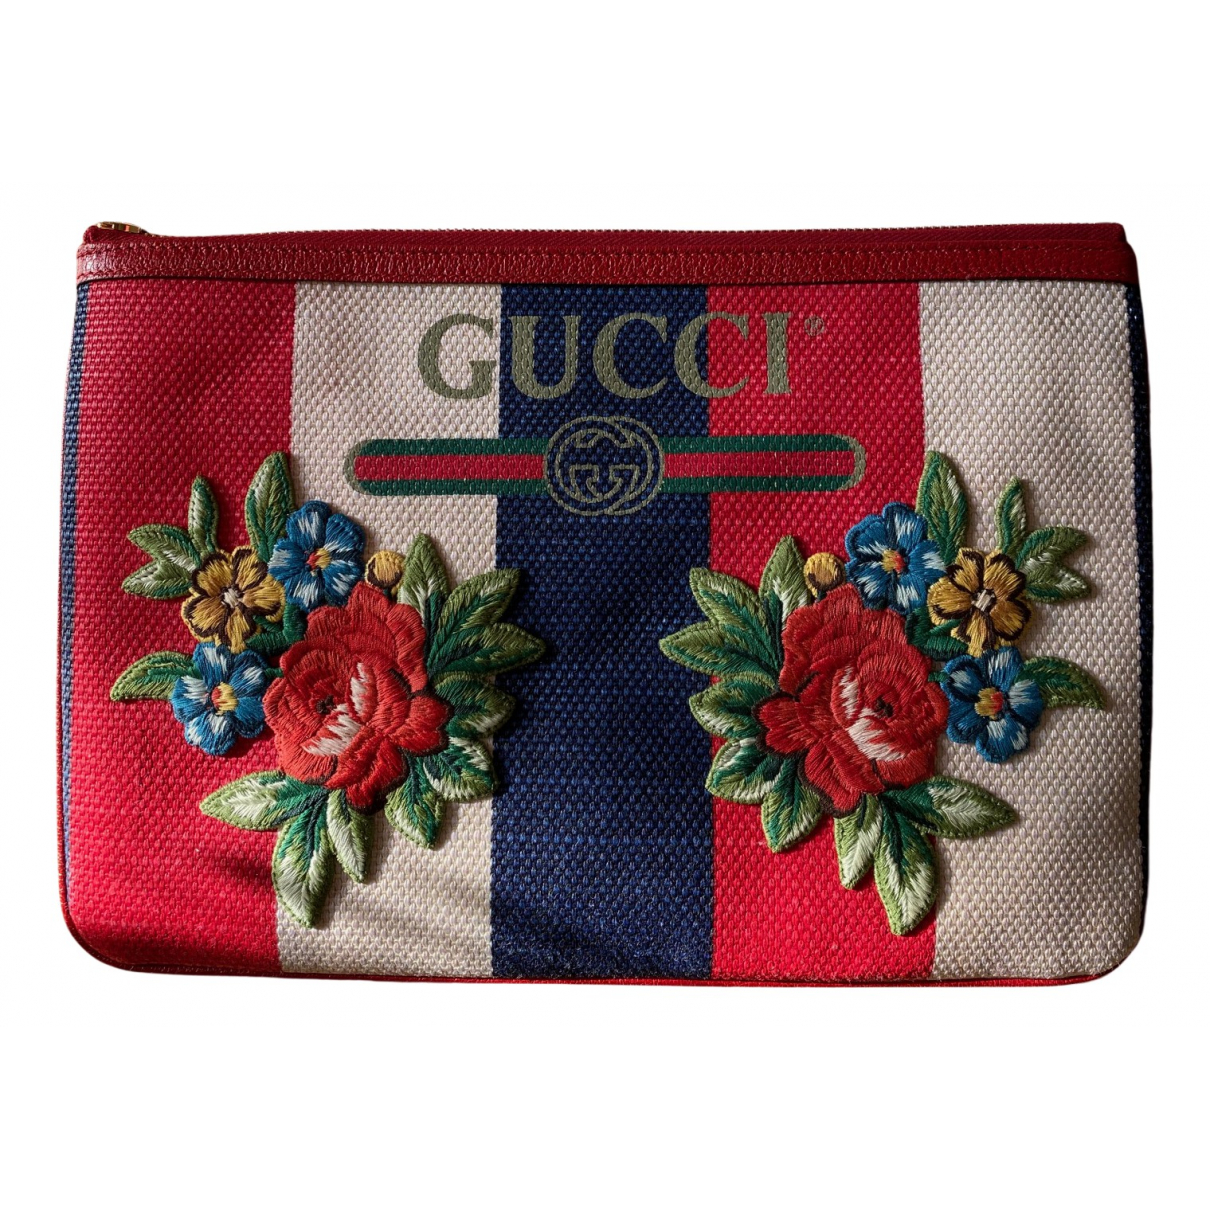 Gucci \N Clutch in  Rot Leinen